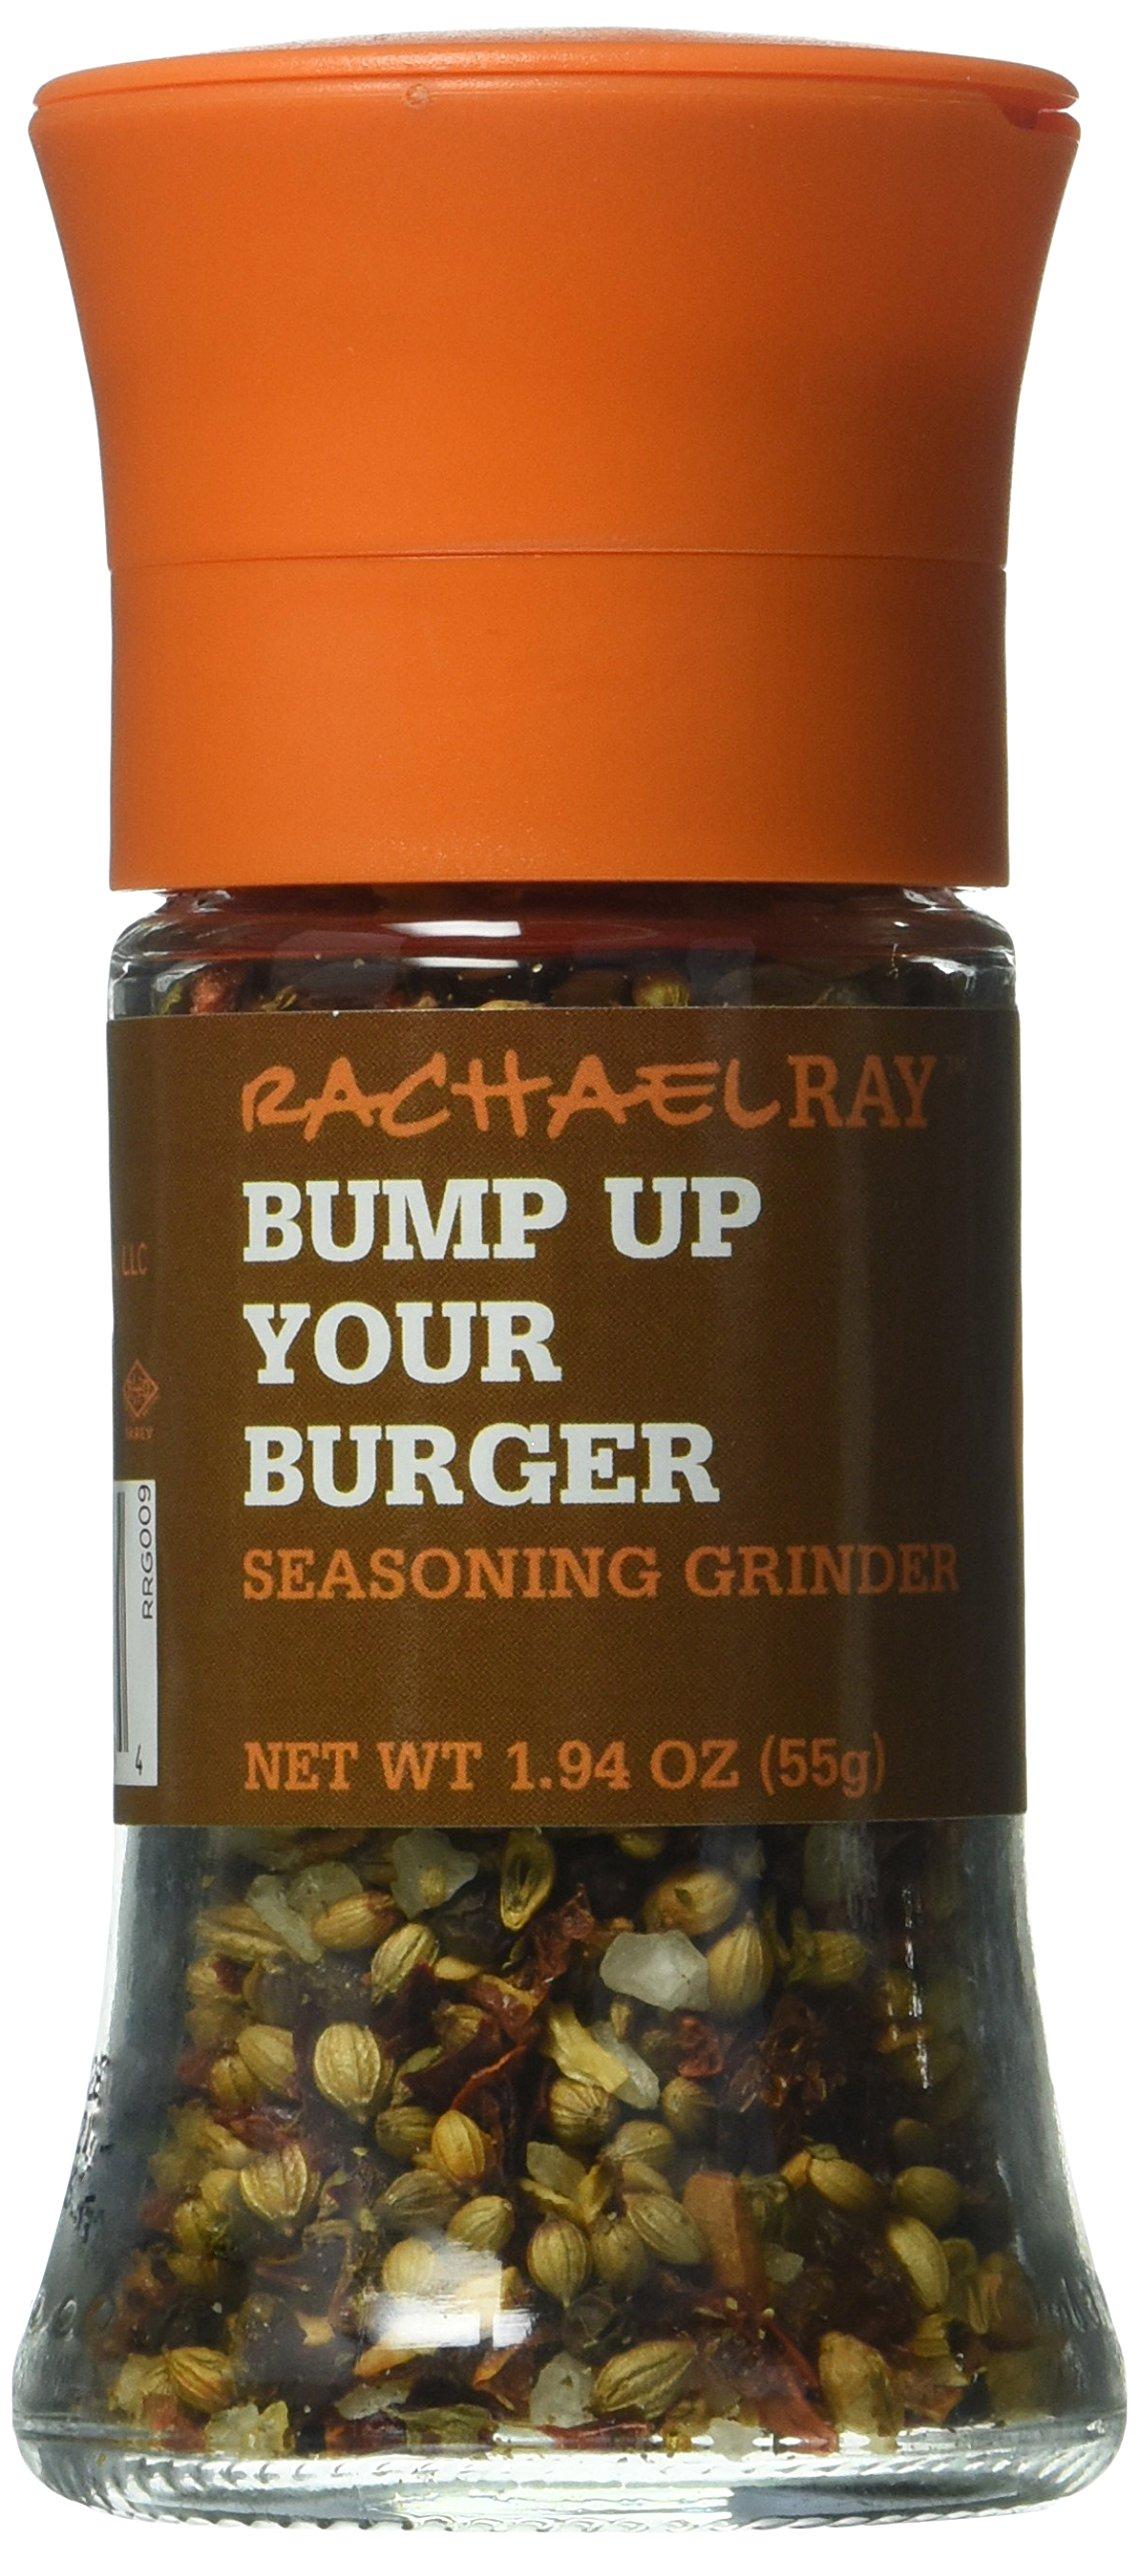 Rachael Ray Bump Up Your Burger Seasoning Grinder, 1.94-Ounce